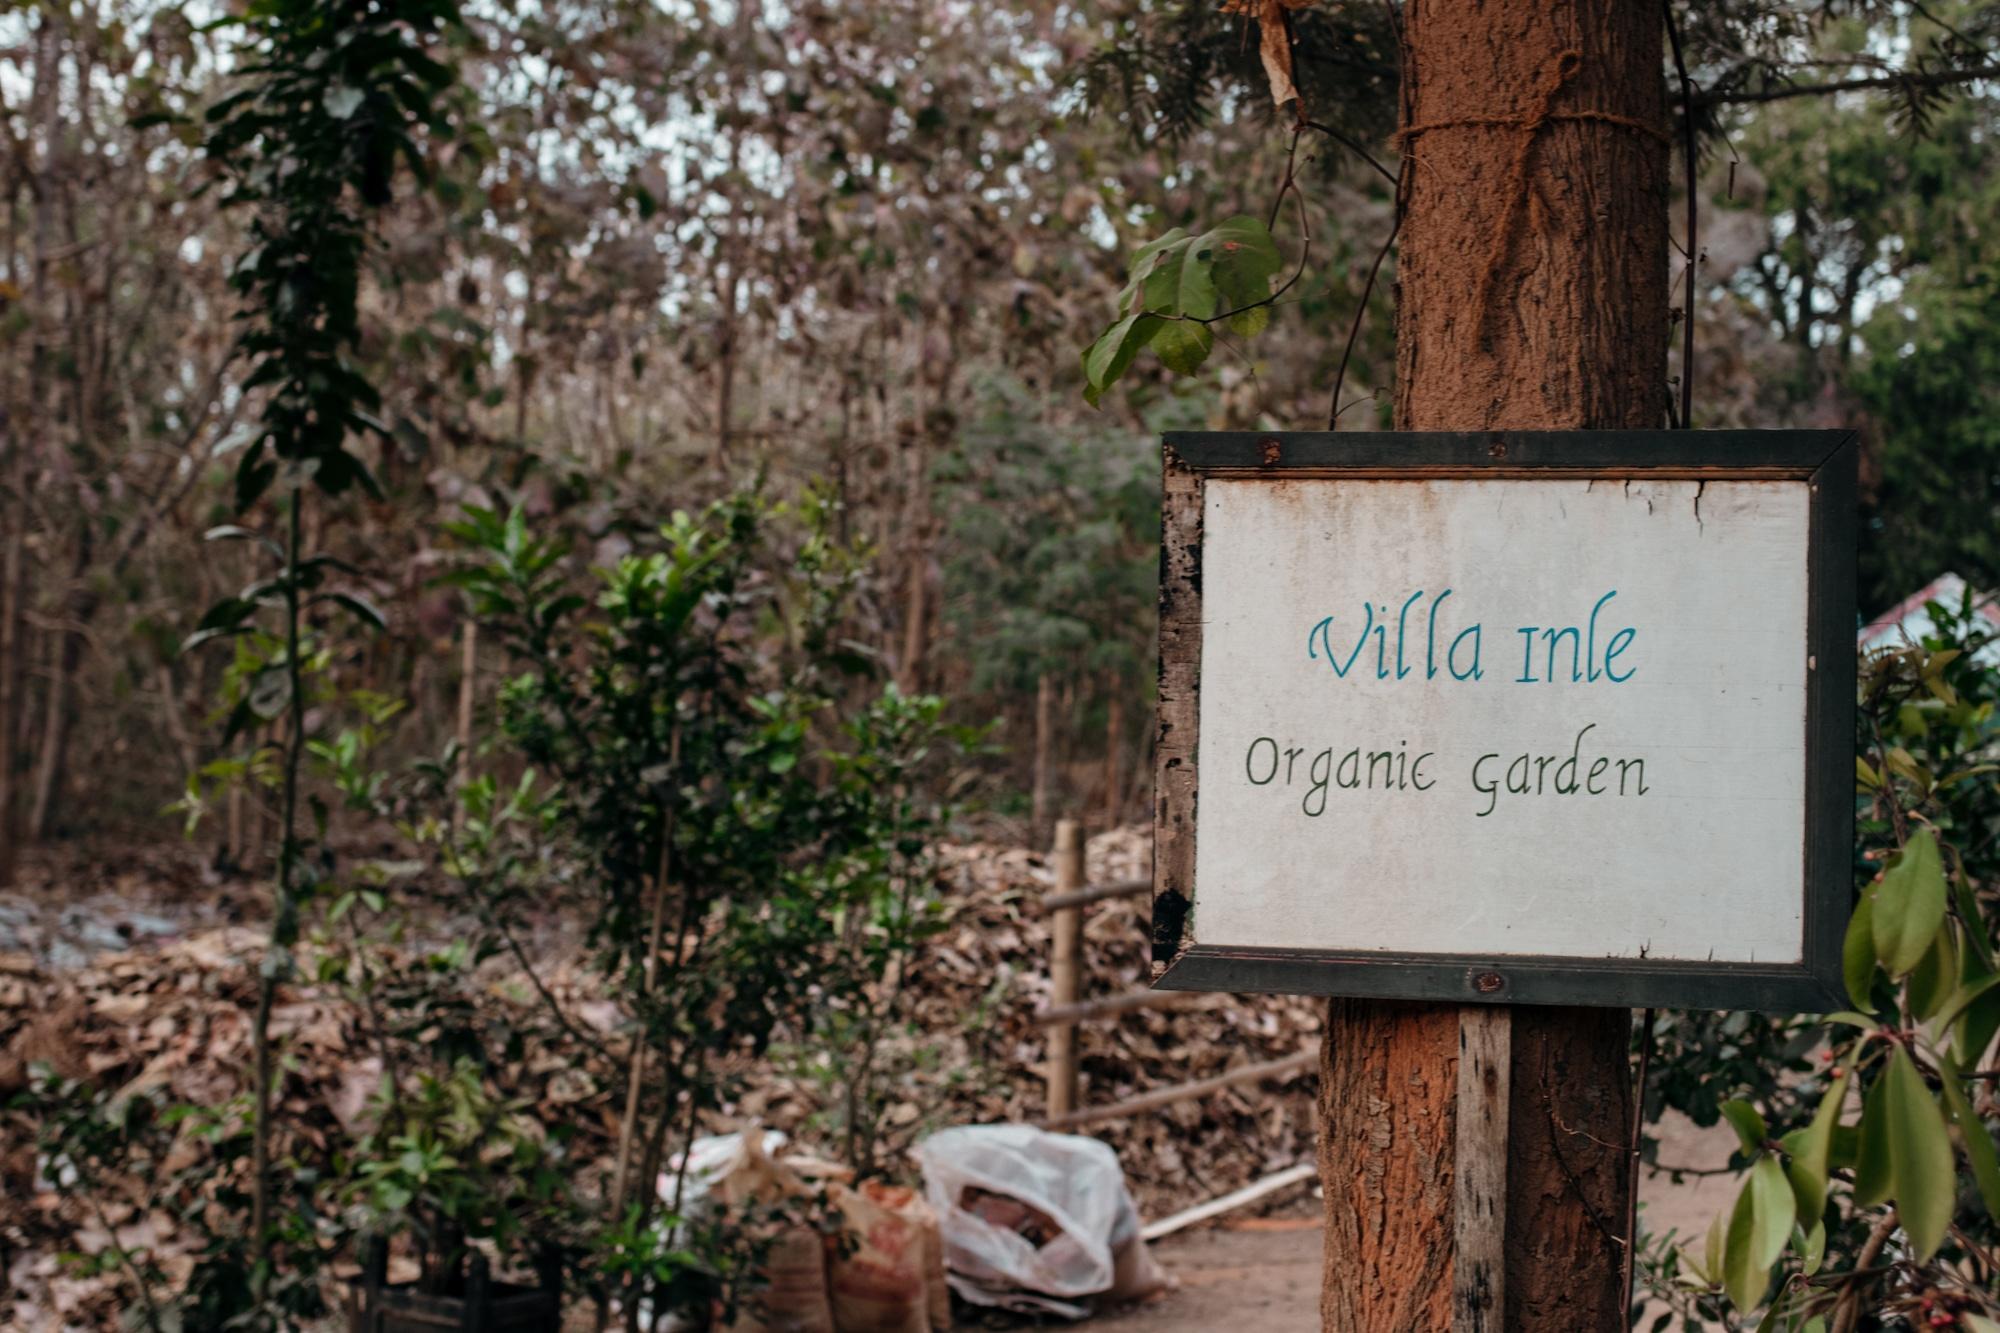 villa inle organic garden